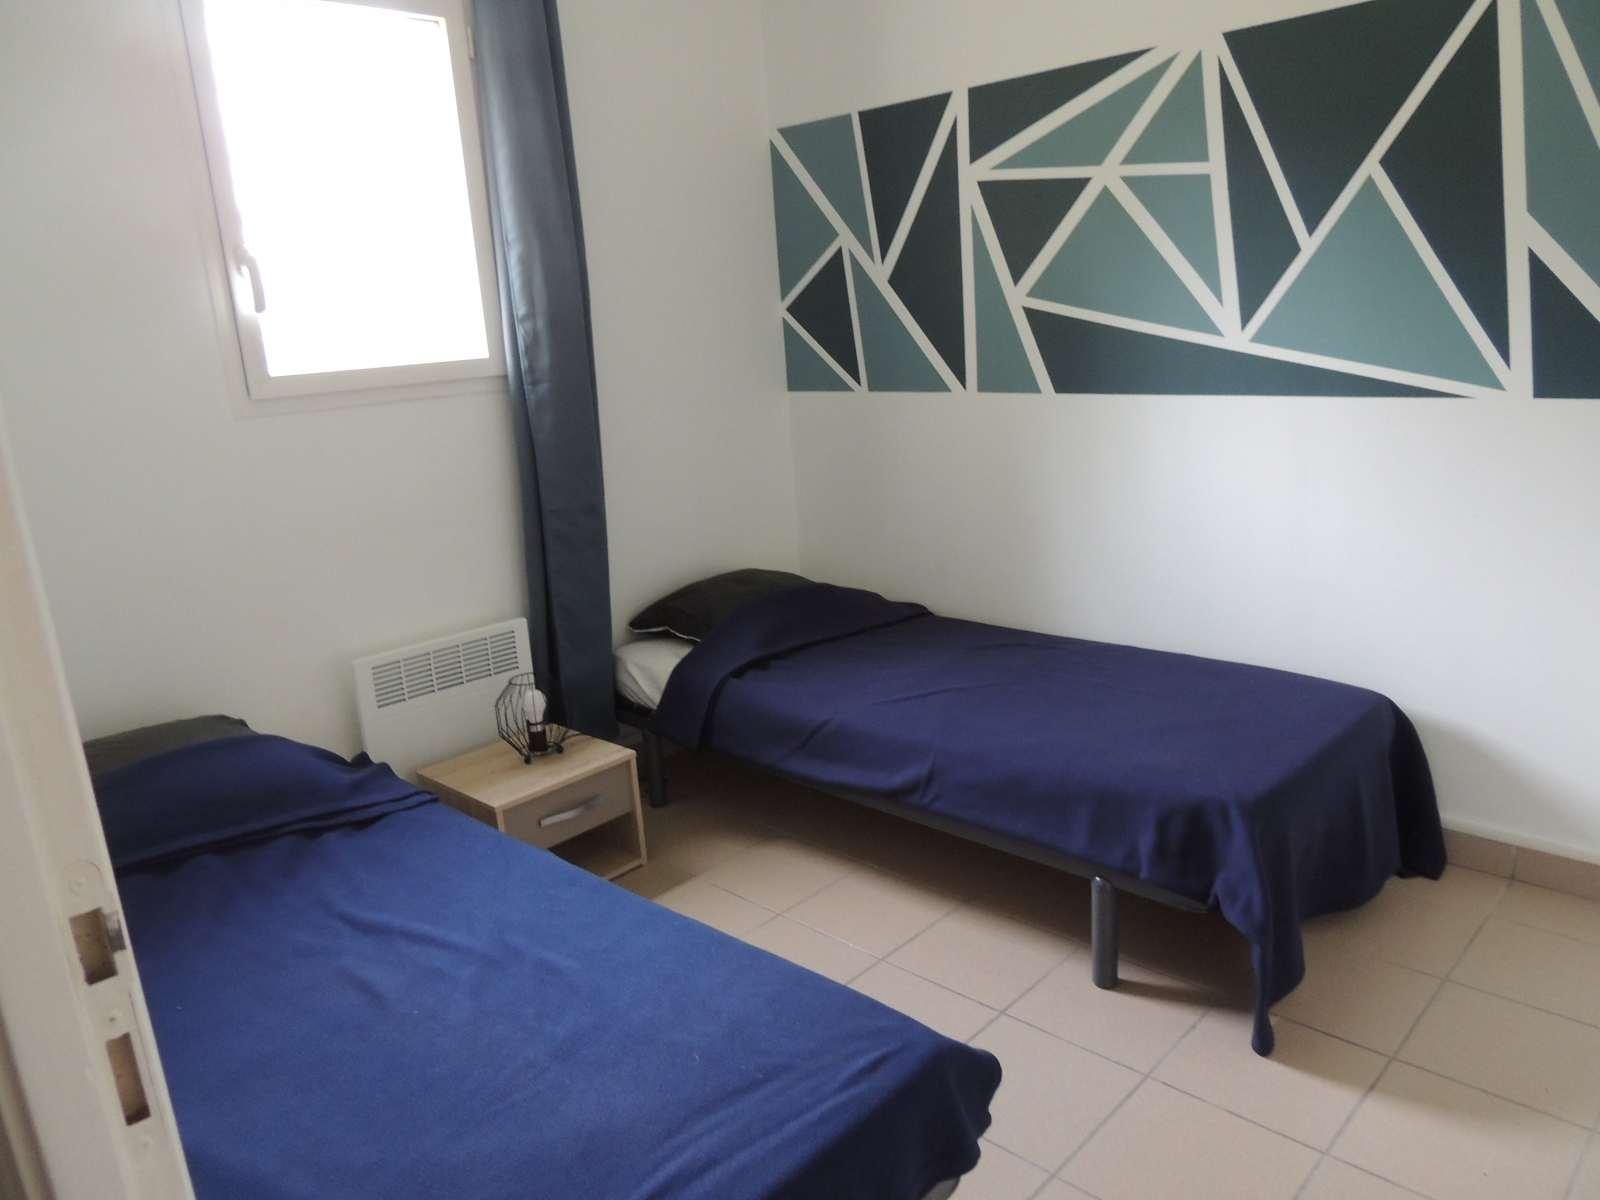 Villas des Pins gite 2 chambres